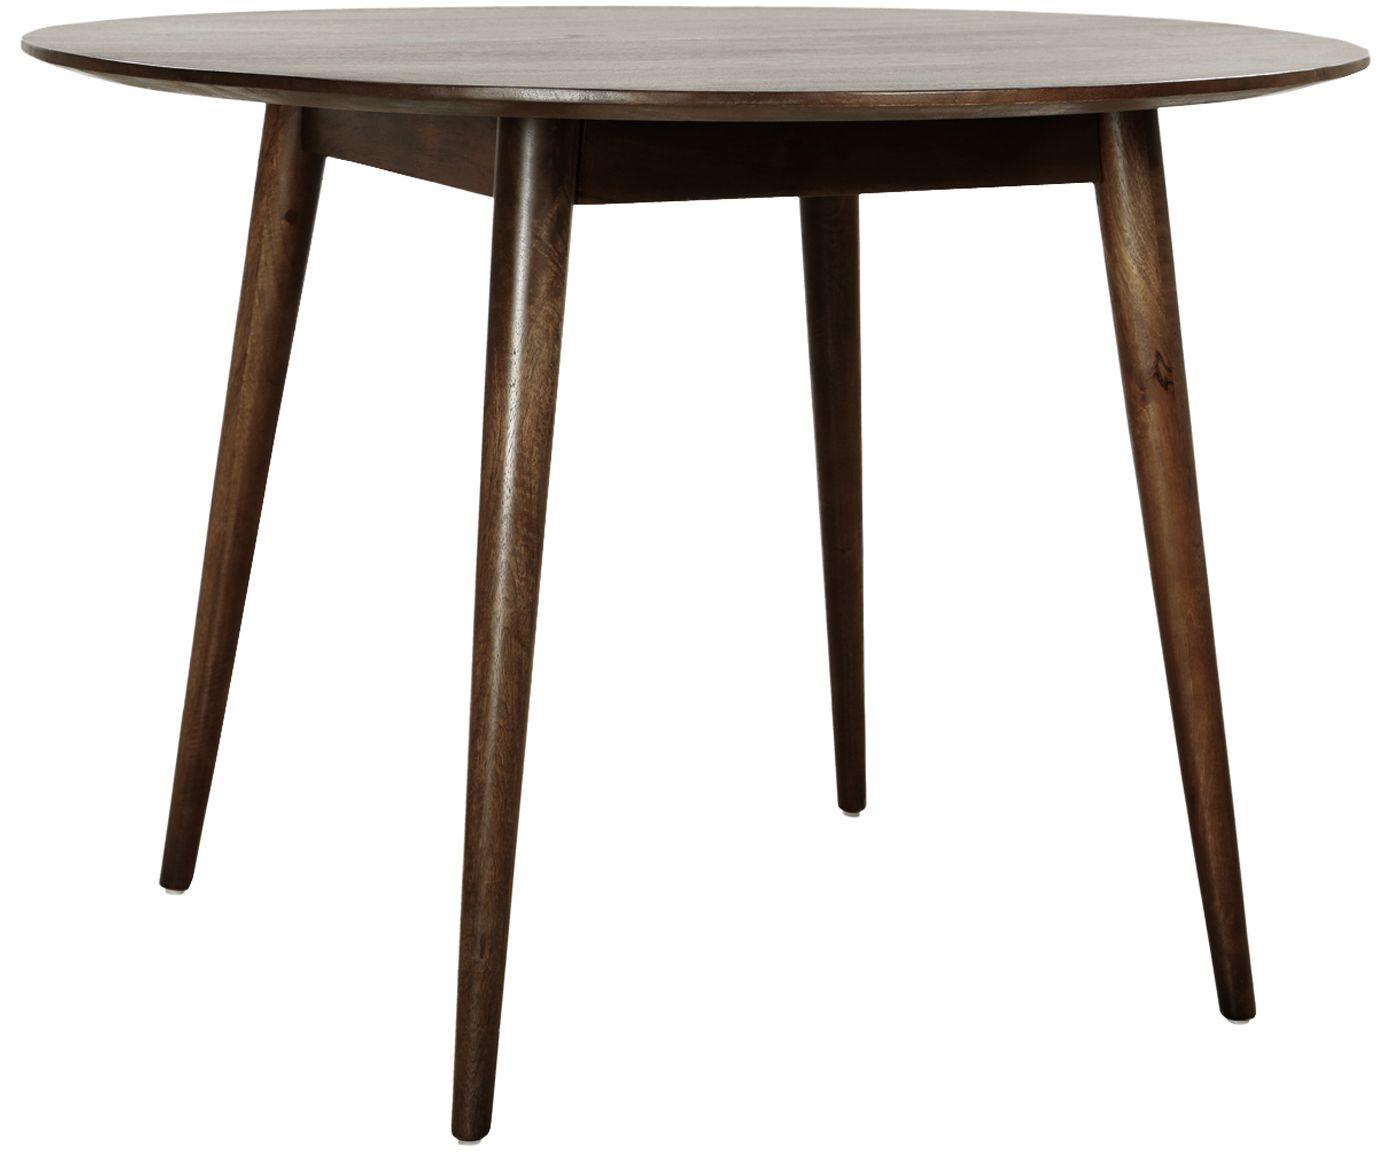 Massivholz Esstisch Oscar Yvonne Table Furniture Decor